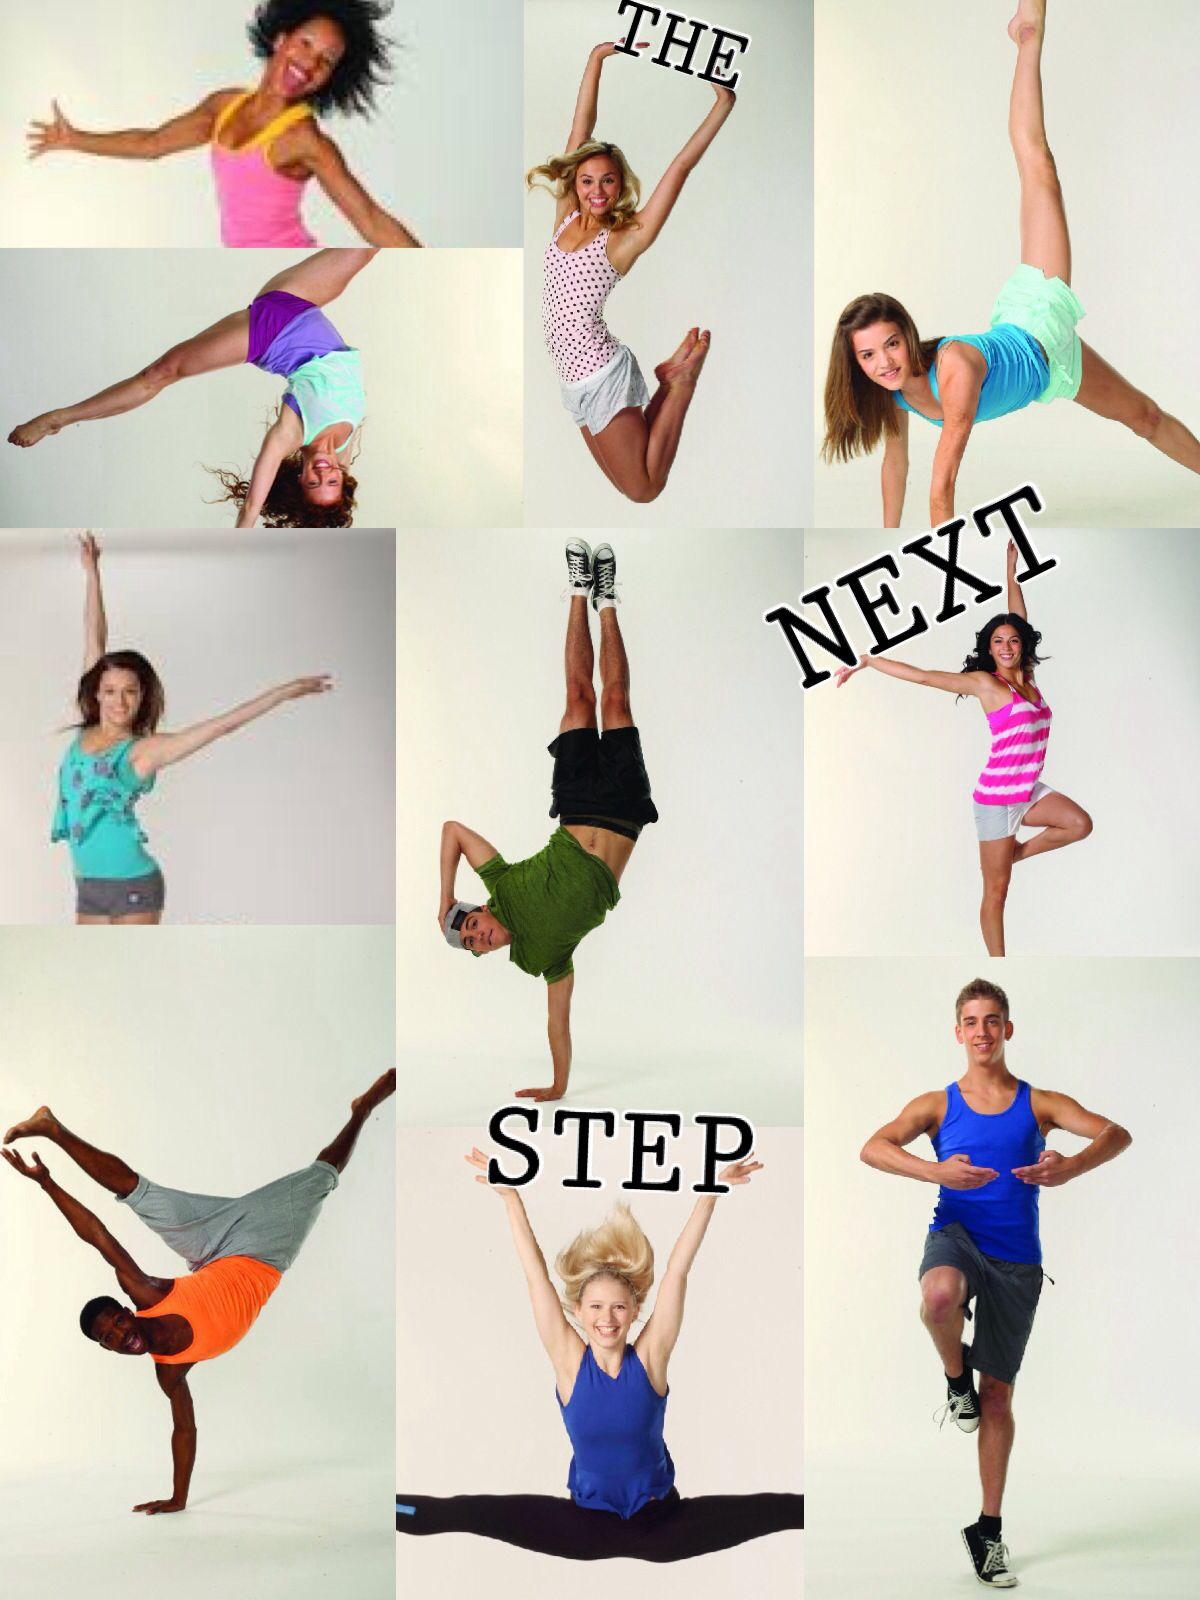 Plover Them Dance Steps The Next Step Step Program